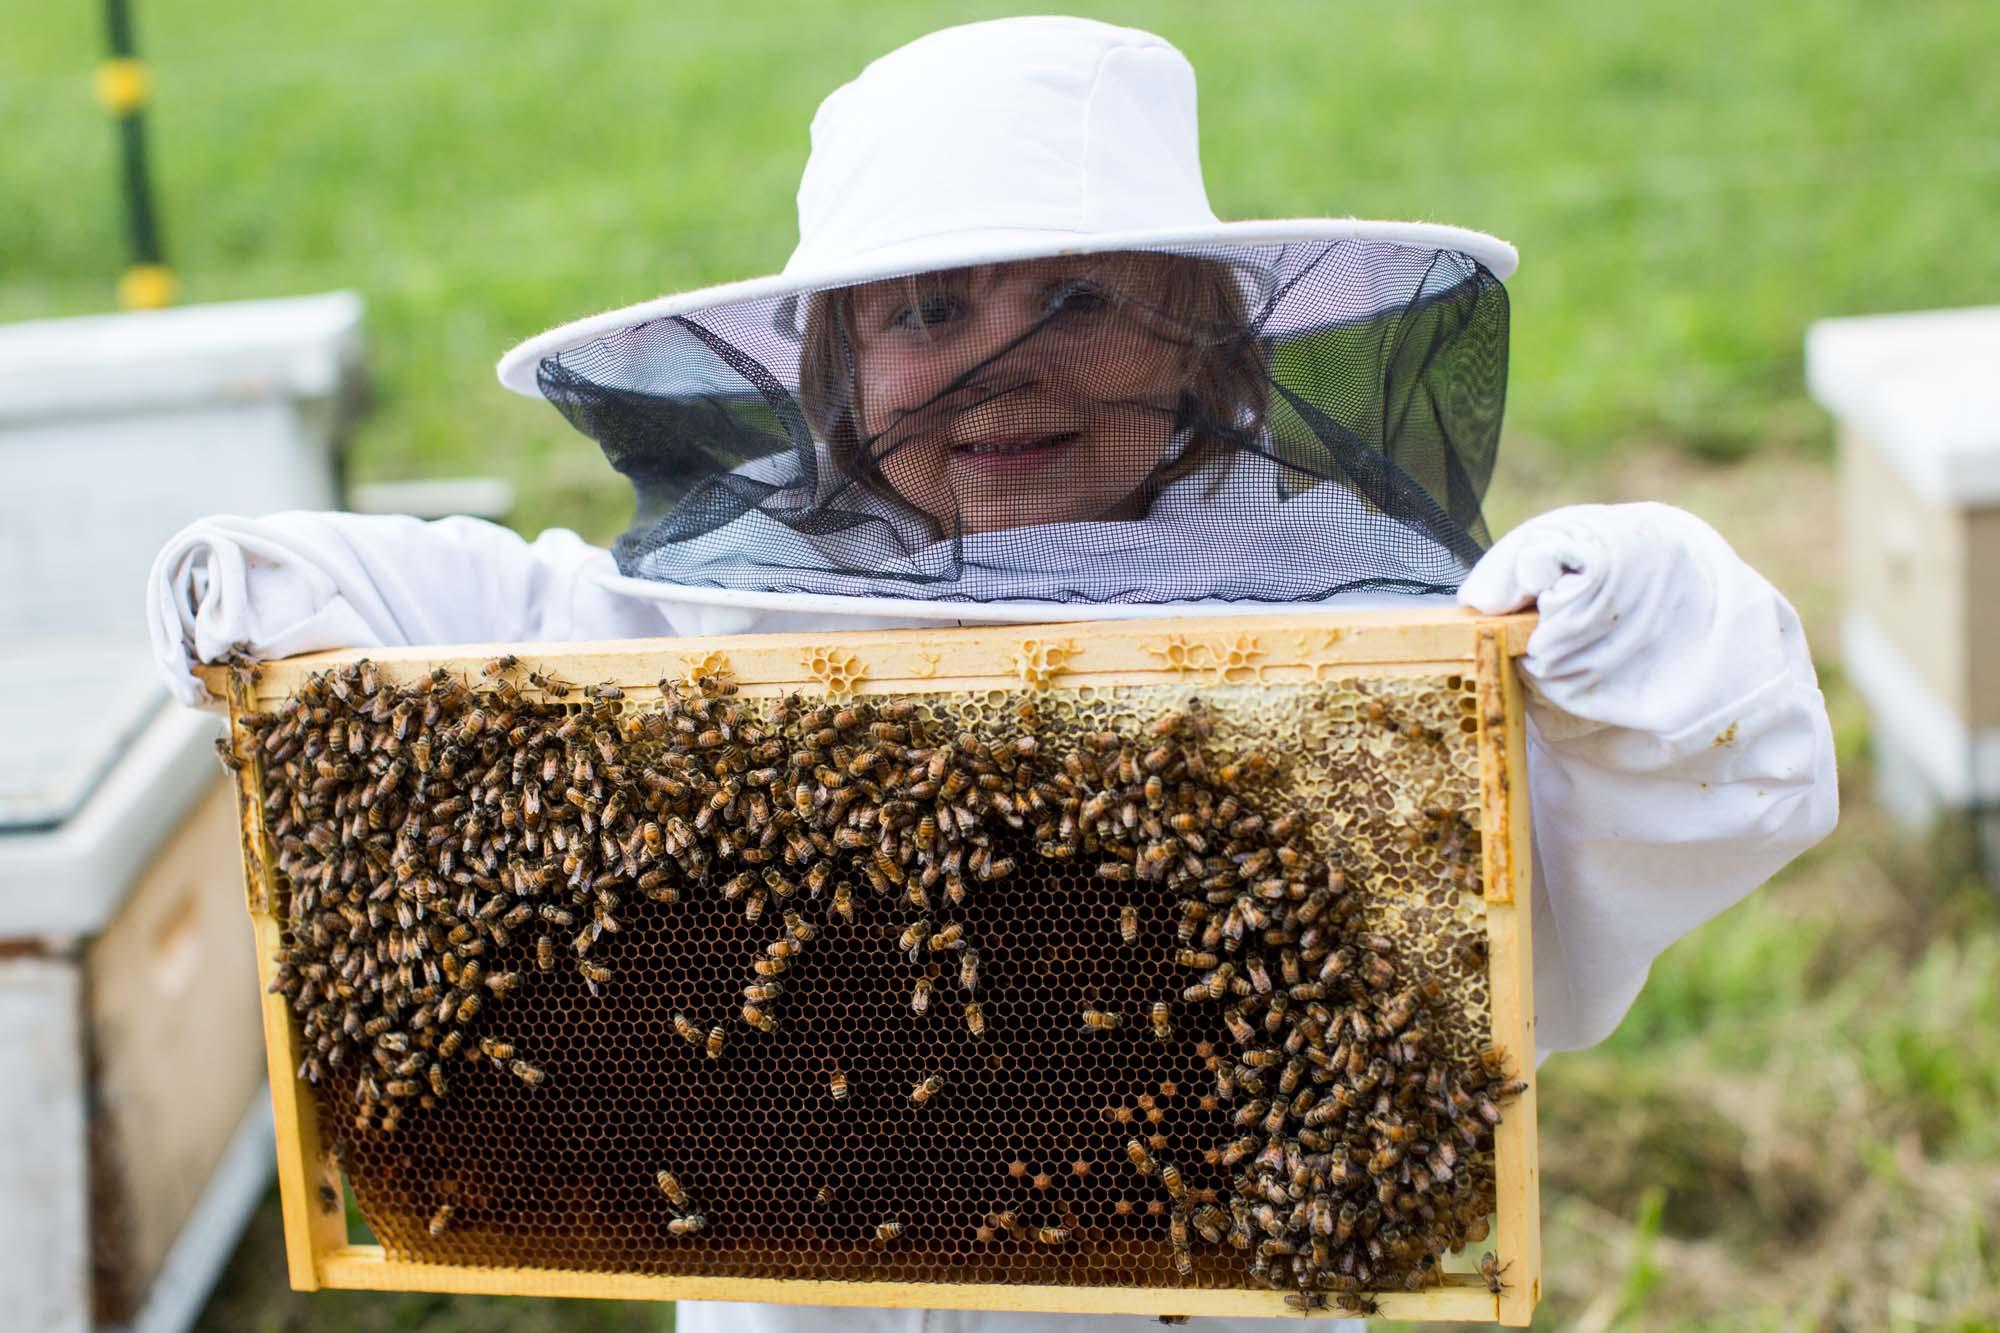 Bee. Honey and Hive   Brevard, NC